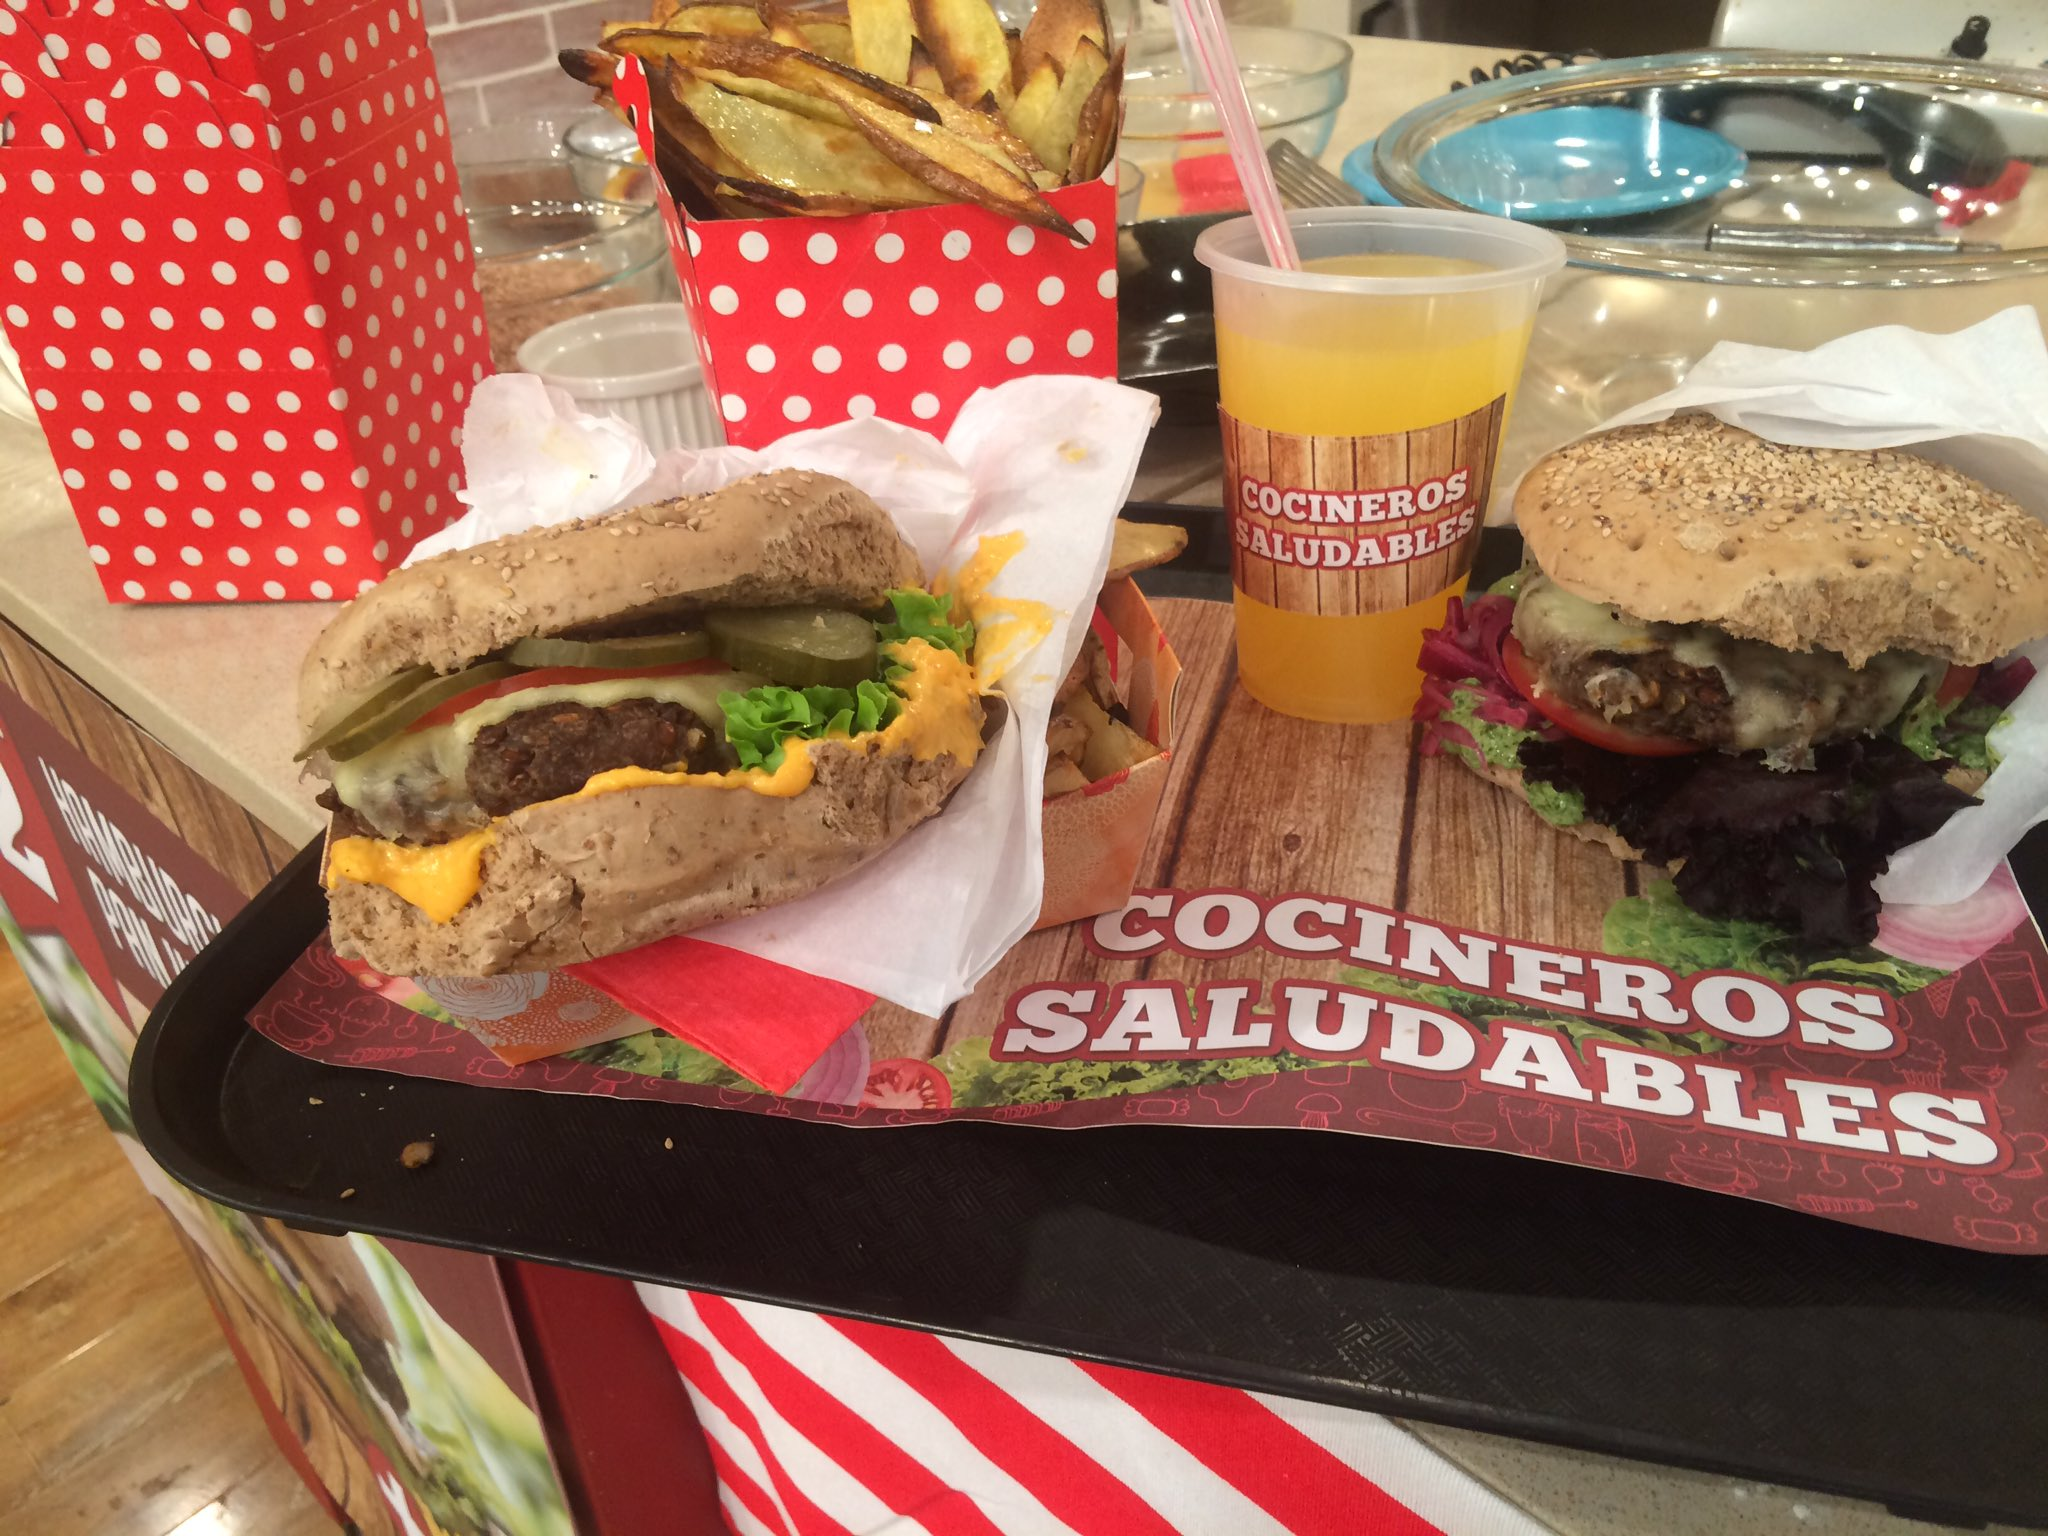 Se viene la Hamburguesa hiper nutritiva en @cocinerosarg con @ximena_saenz @juanitoferrara @SivoriDiego @TV_Publica https://t.co/i1nYj6ezgW